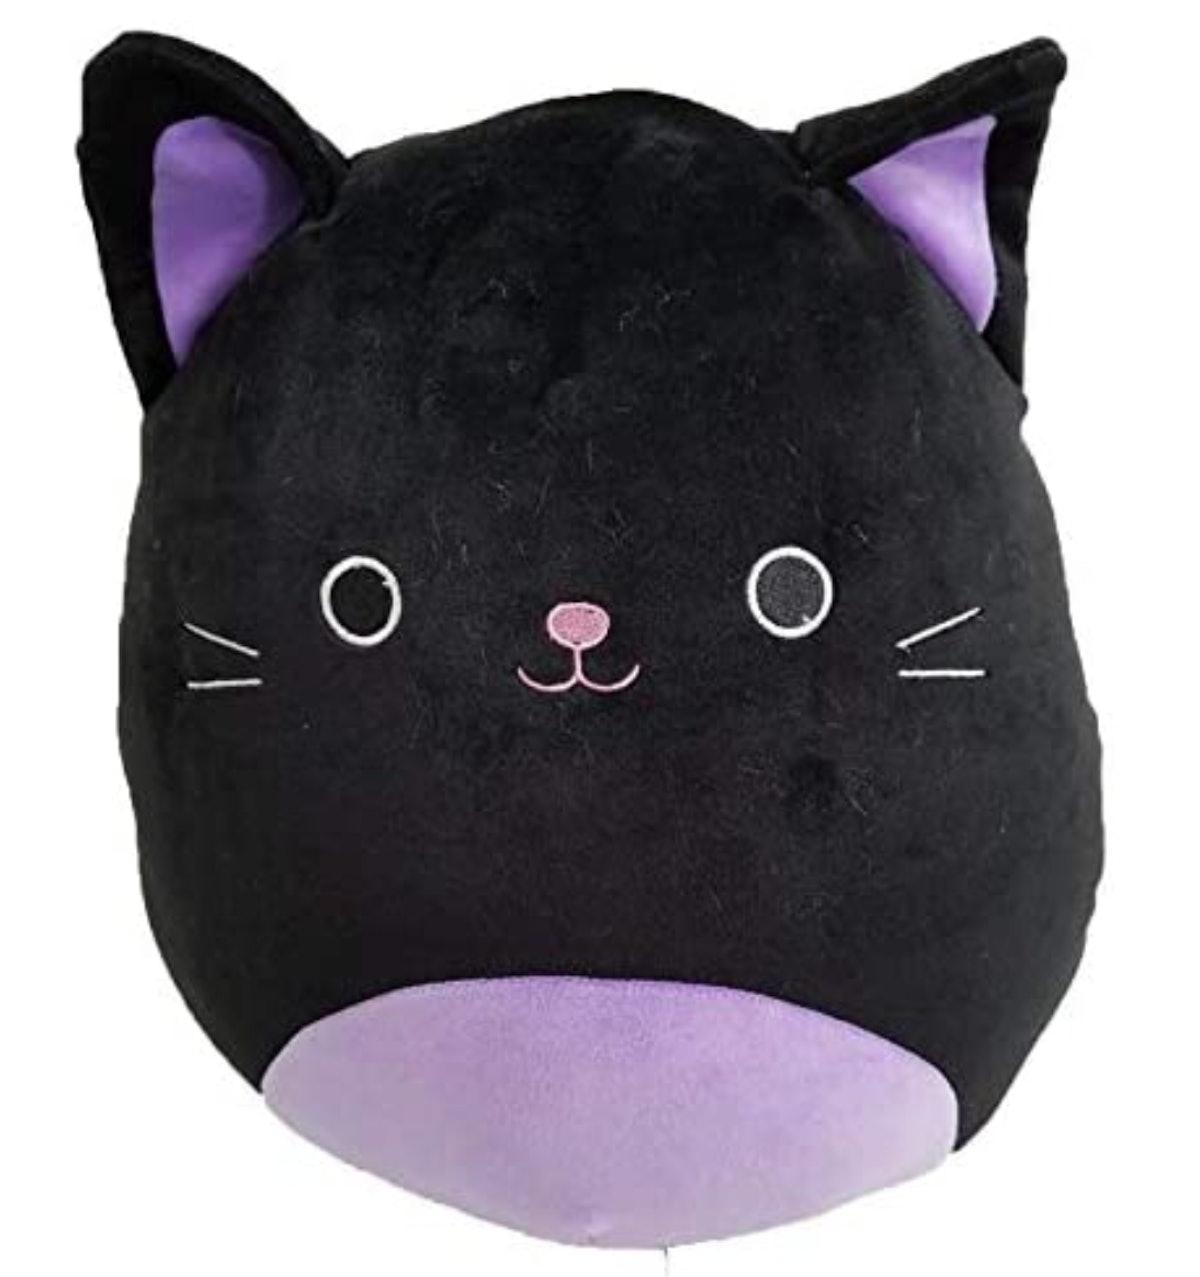 Autumn The Black Cat Halloween Squishmallow